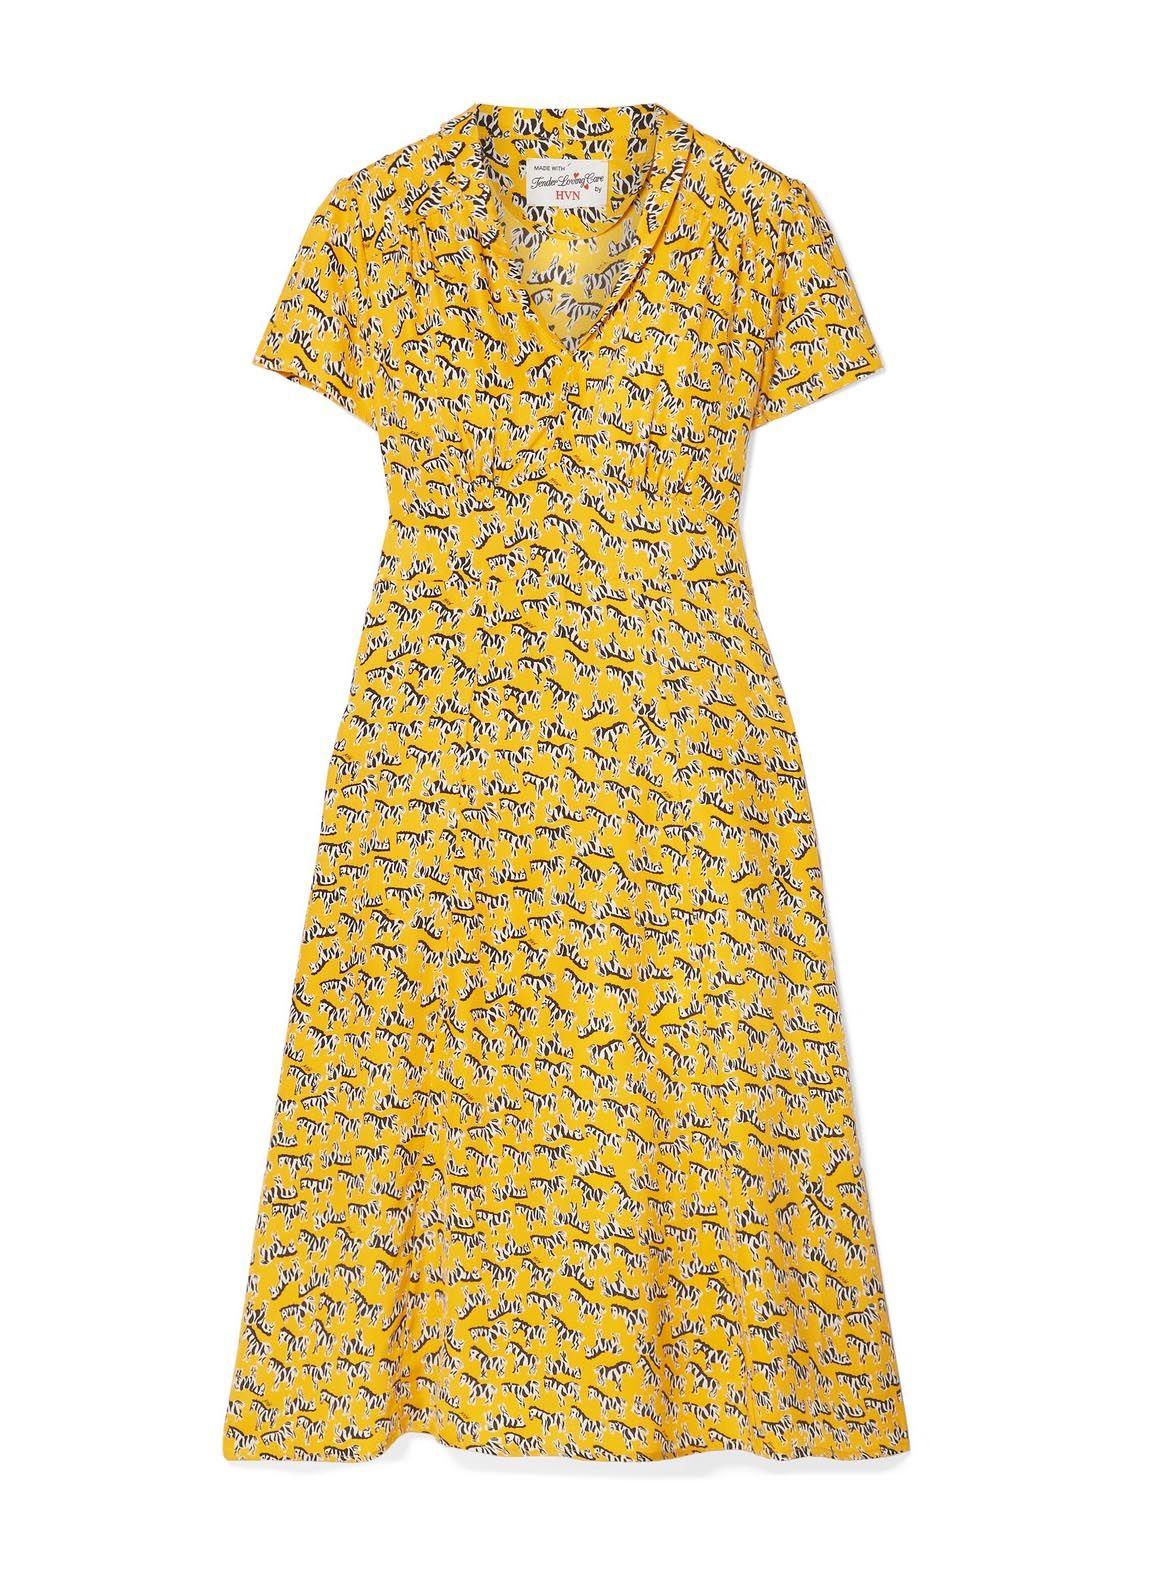 Yellow Zebra Morgan Dress Hvn Flattering Fashion Morgan Dress Dress Size Chart